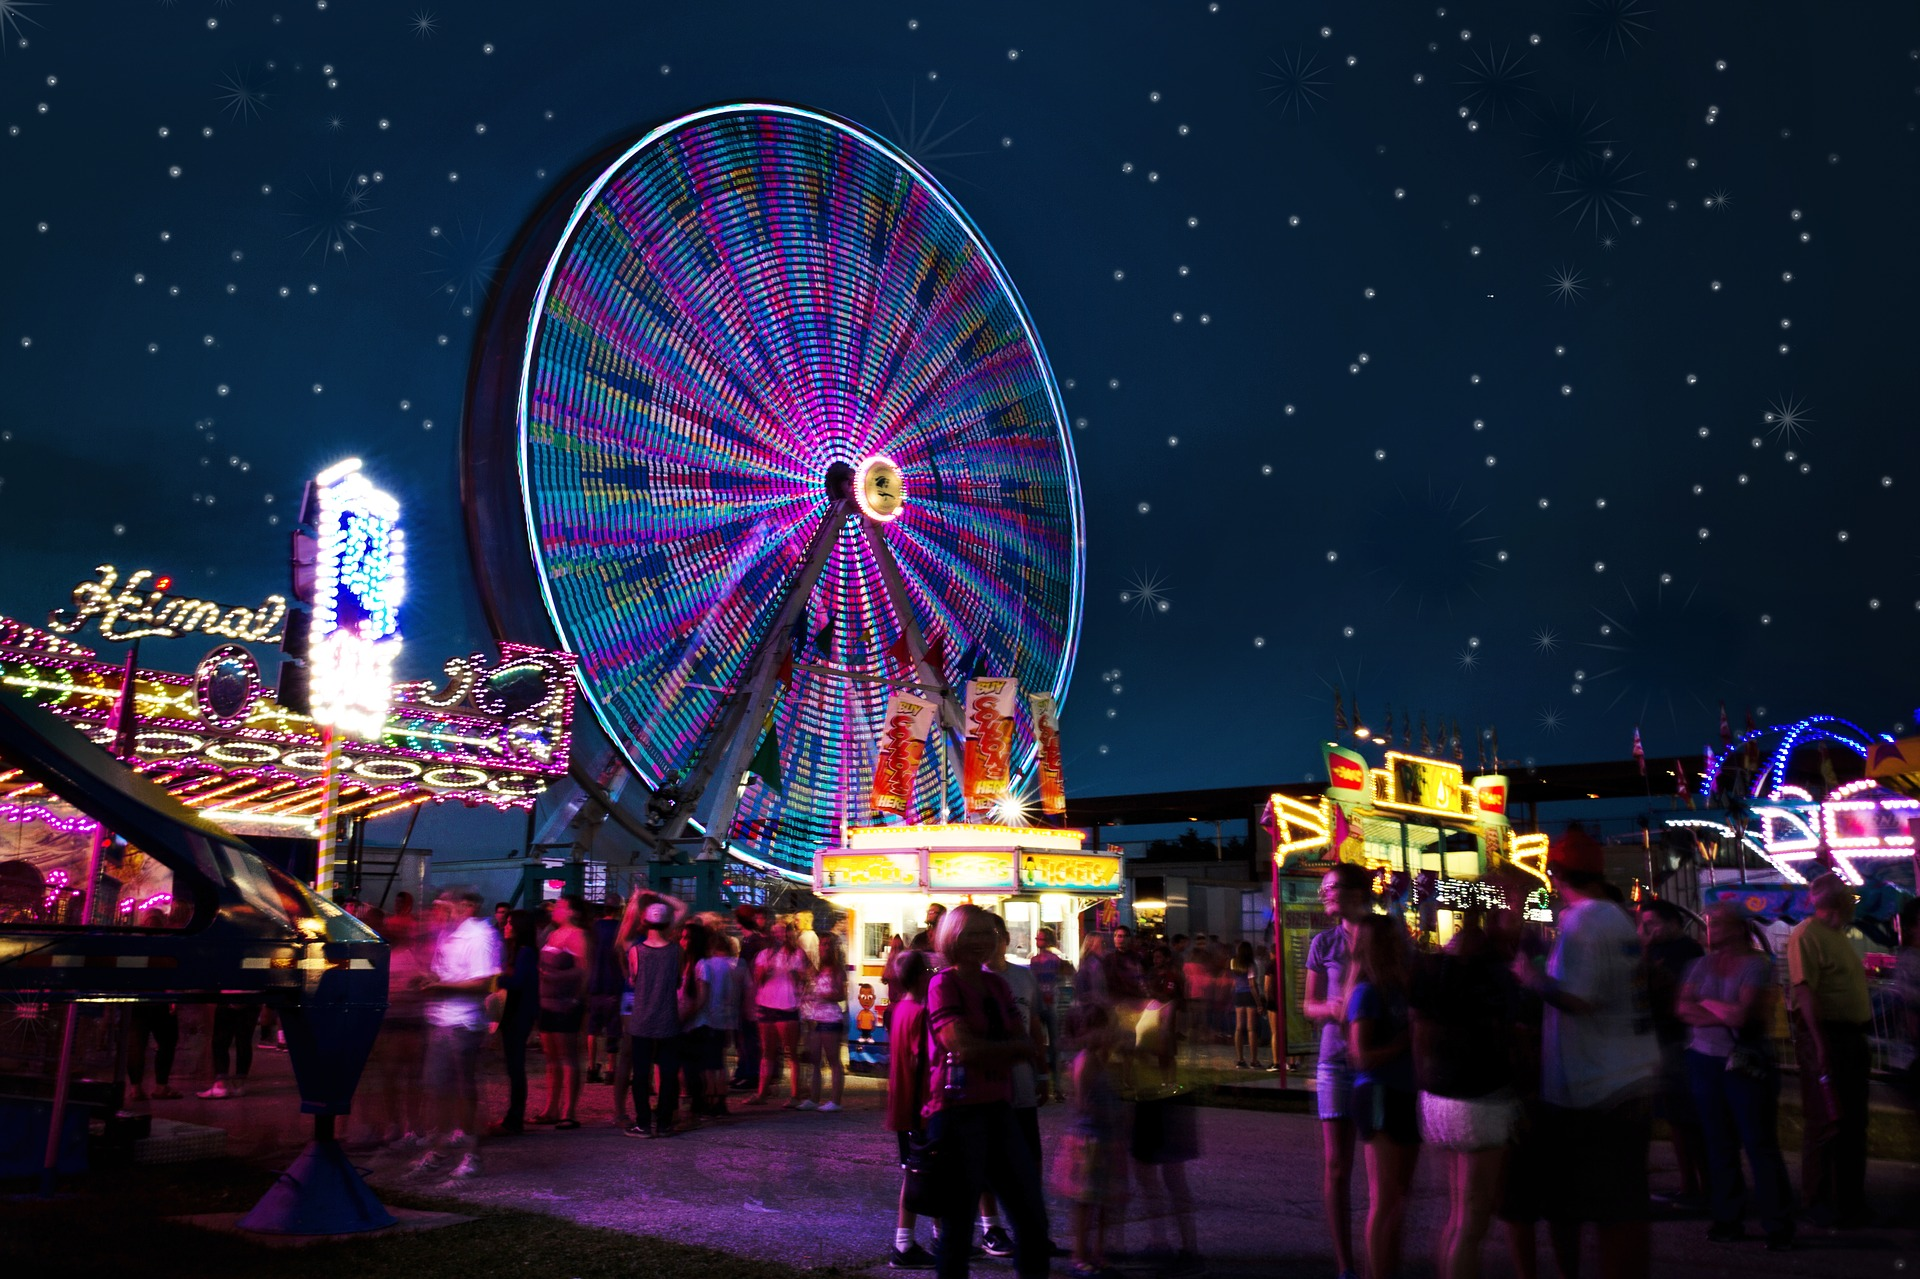 Carnival rides 2648047 1920